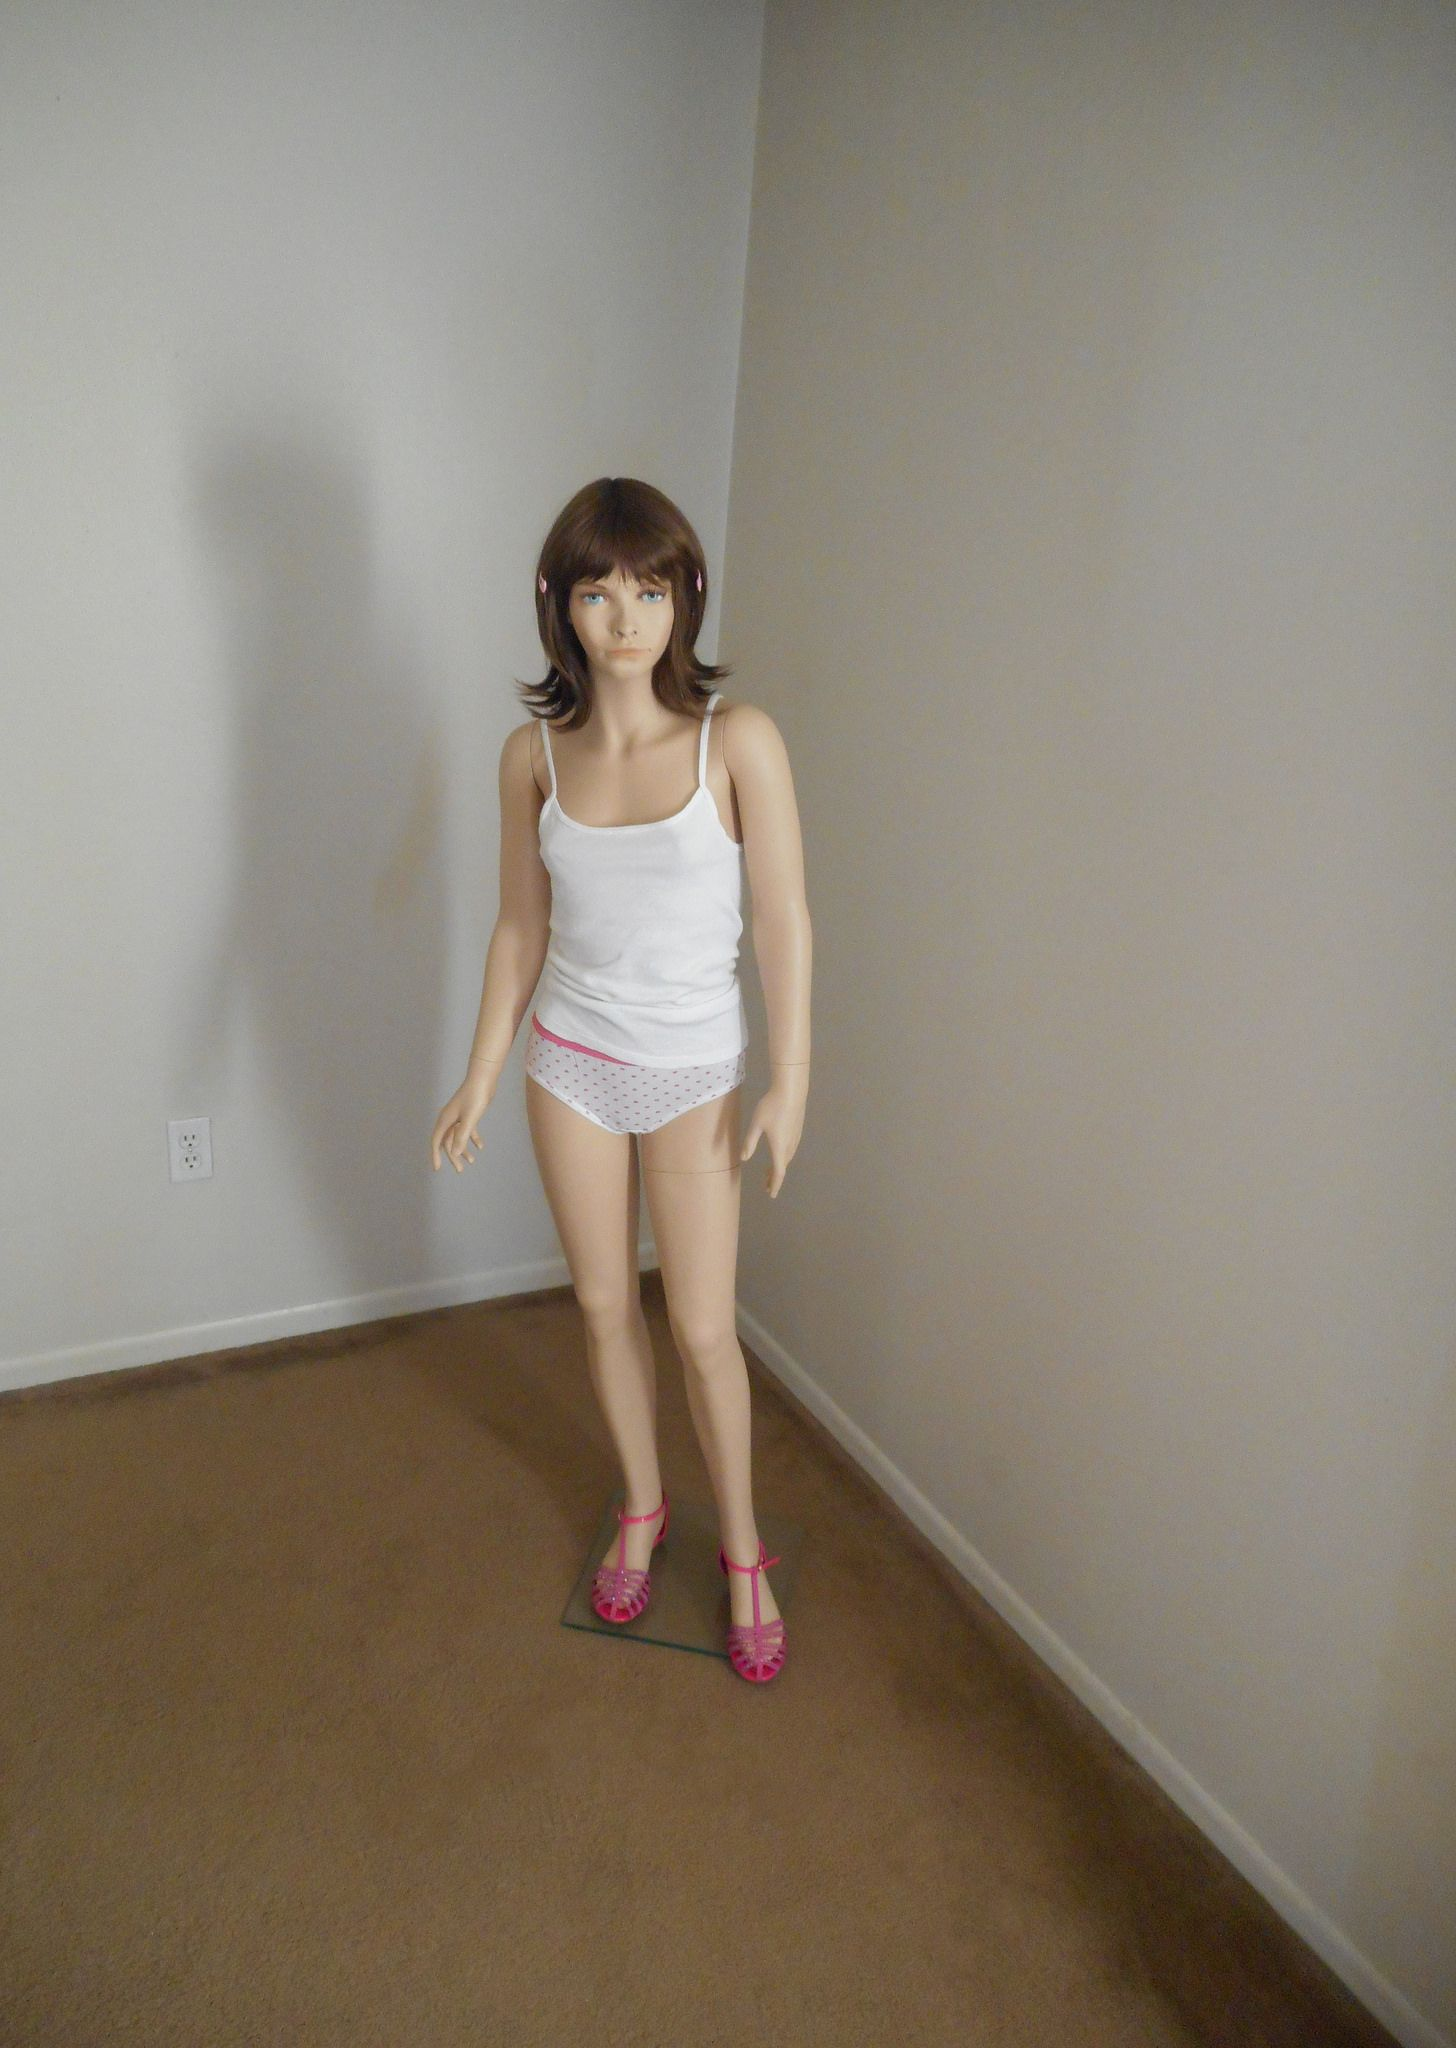 https://flic.kr/p/EpzgB8 | Krissy in the corner. | Videos of Krissy can be seen here: www.youtube.com/playlist?list=PLo50bfTa6YGkI-ir-NBlr5EDqt...